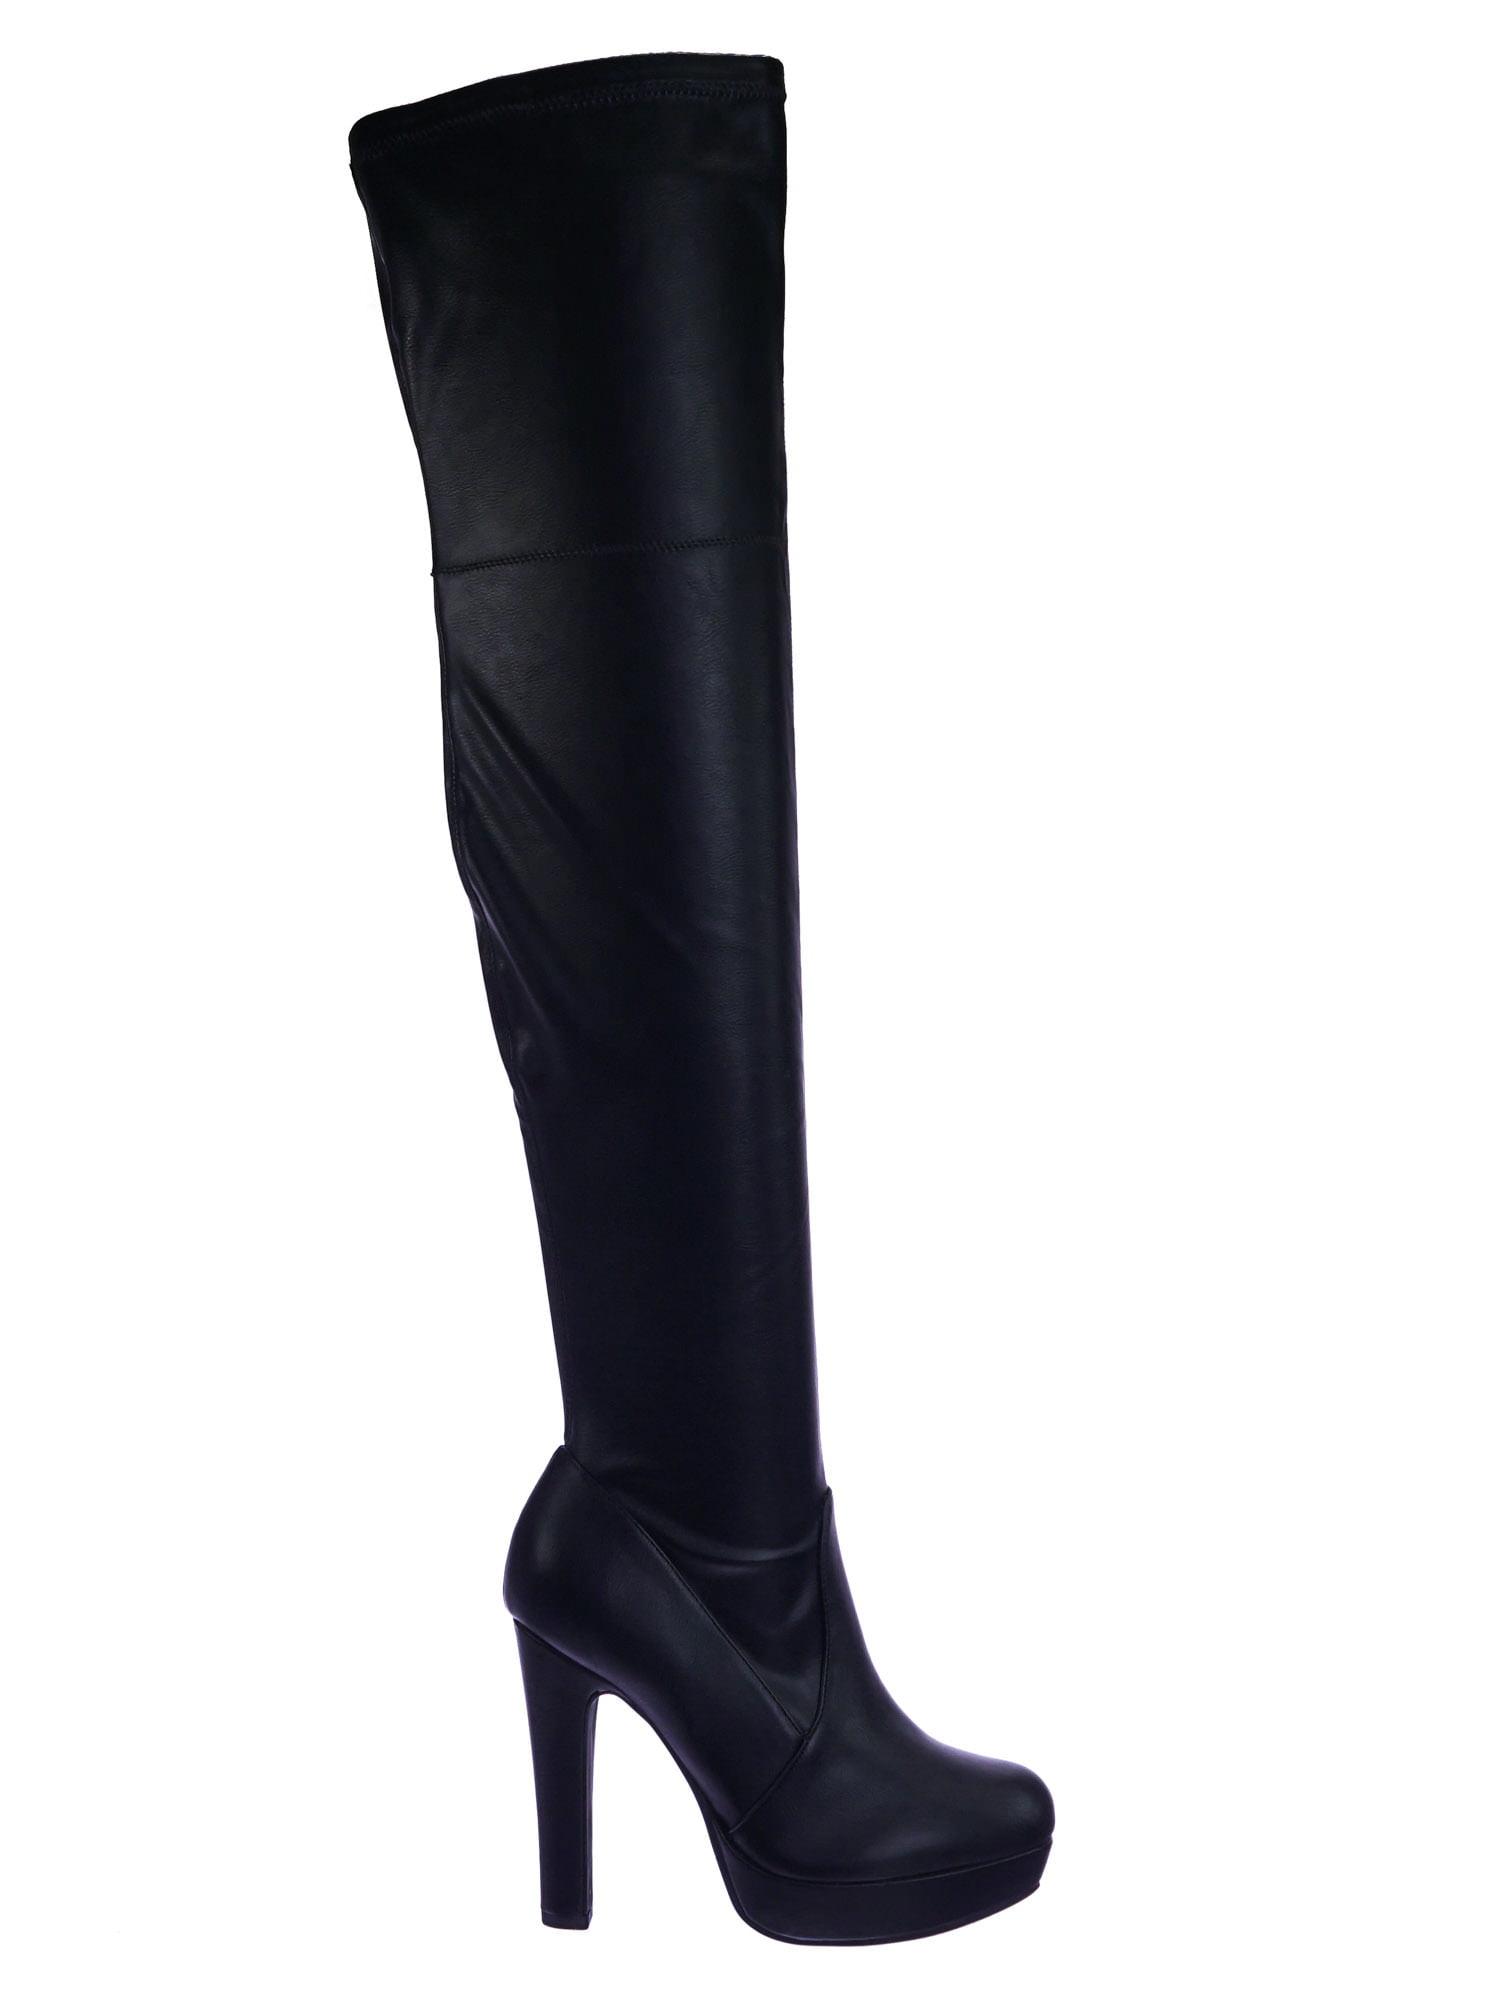 Yokun by Delicious, Stretch Thigh High Over Knee OTK Platform High Heel Dress Boots